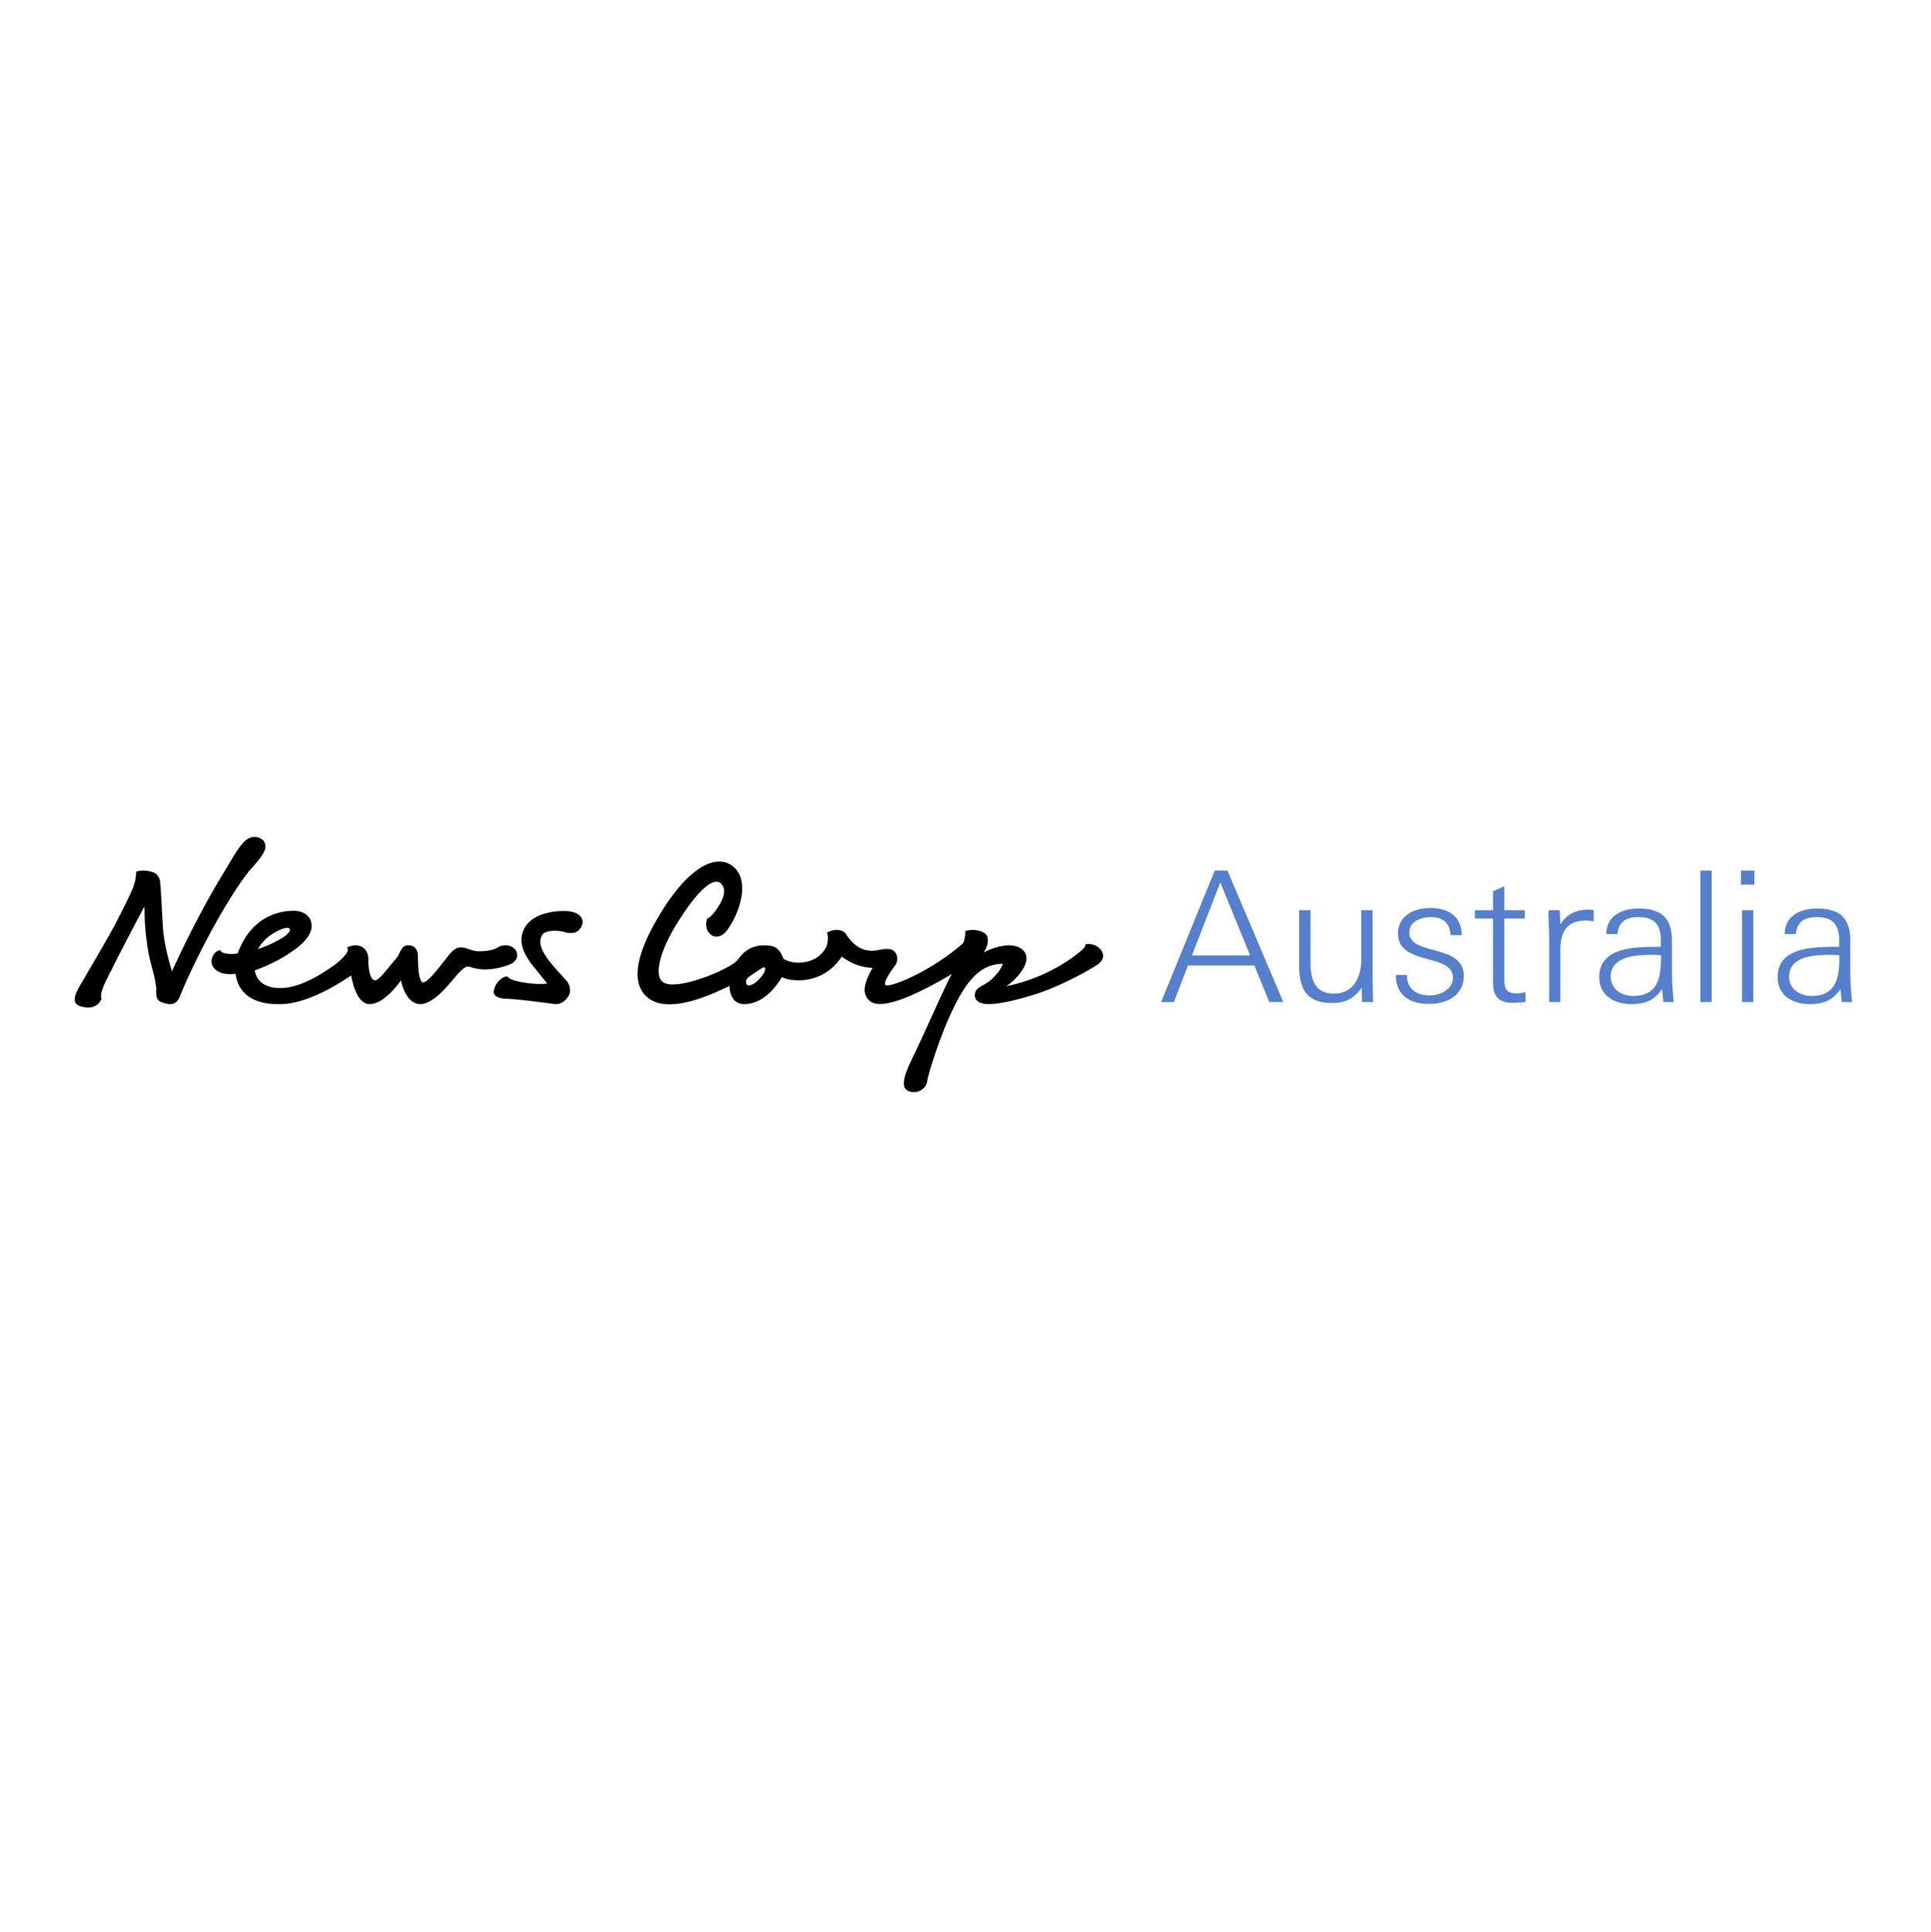 News-Corp-Australia.jpg